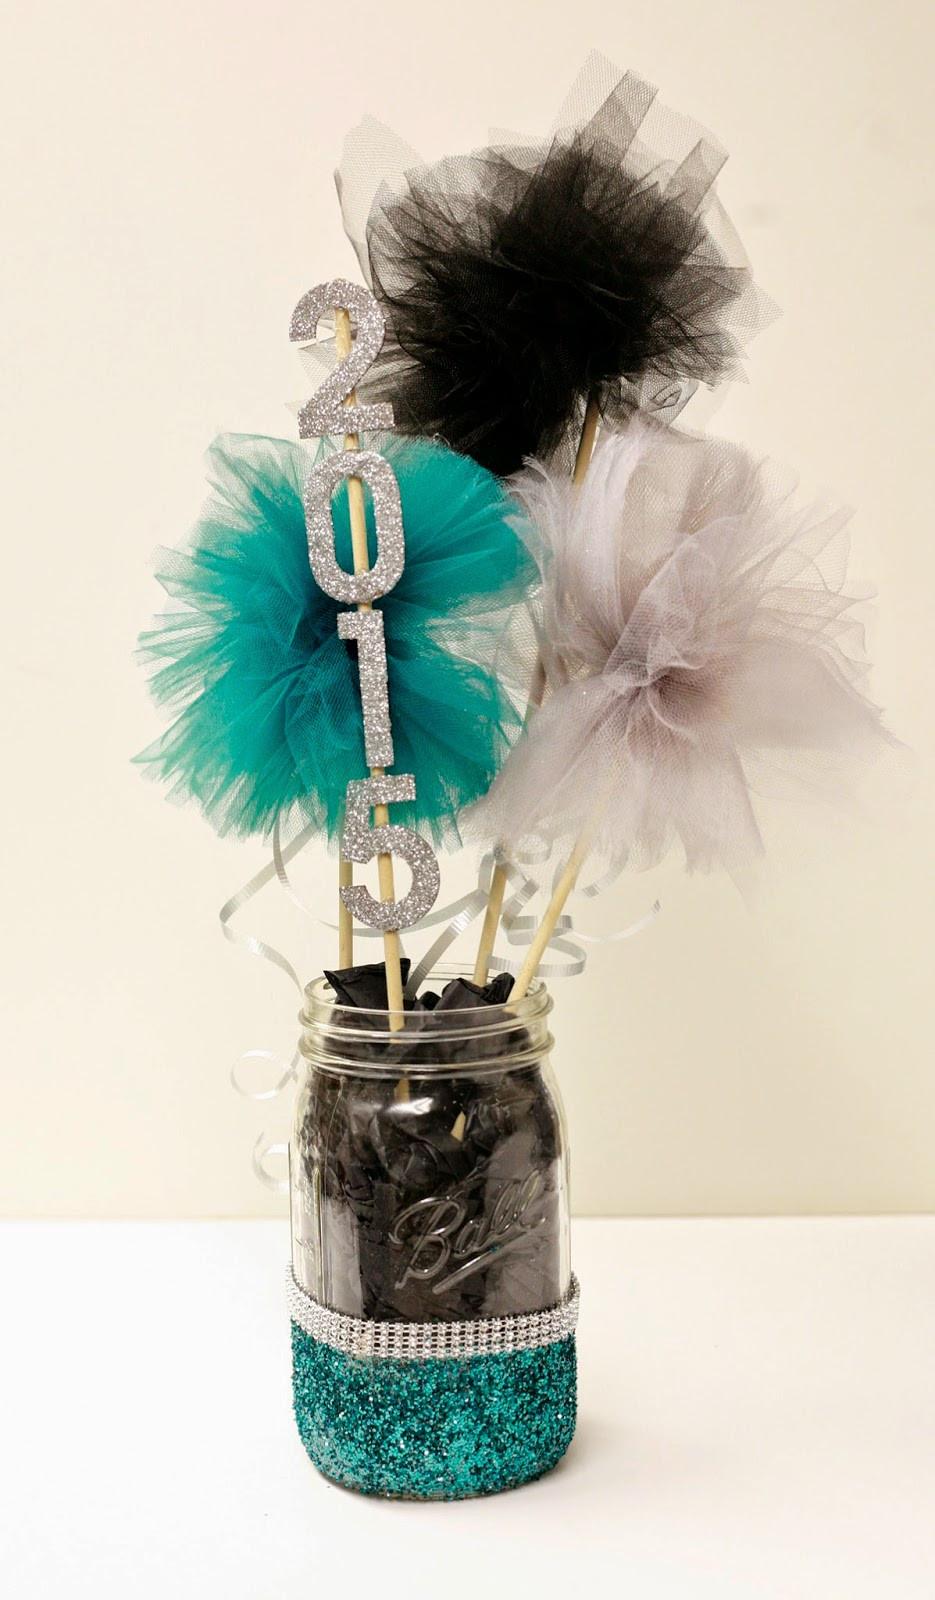 Centerpiece Ideas For Graduation Party  Ben Franklin Crafts and Frame Shop DIY Graduation Party Decor